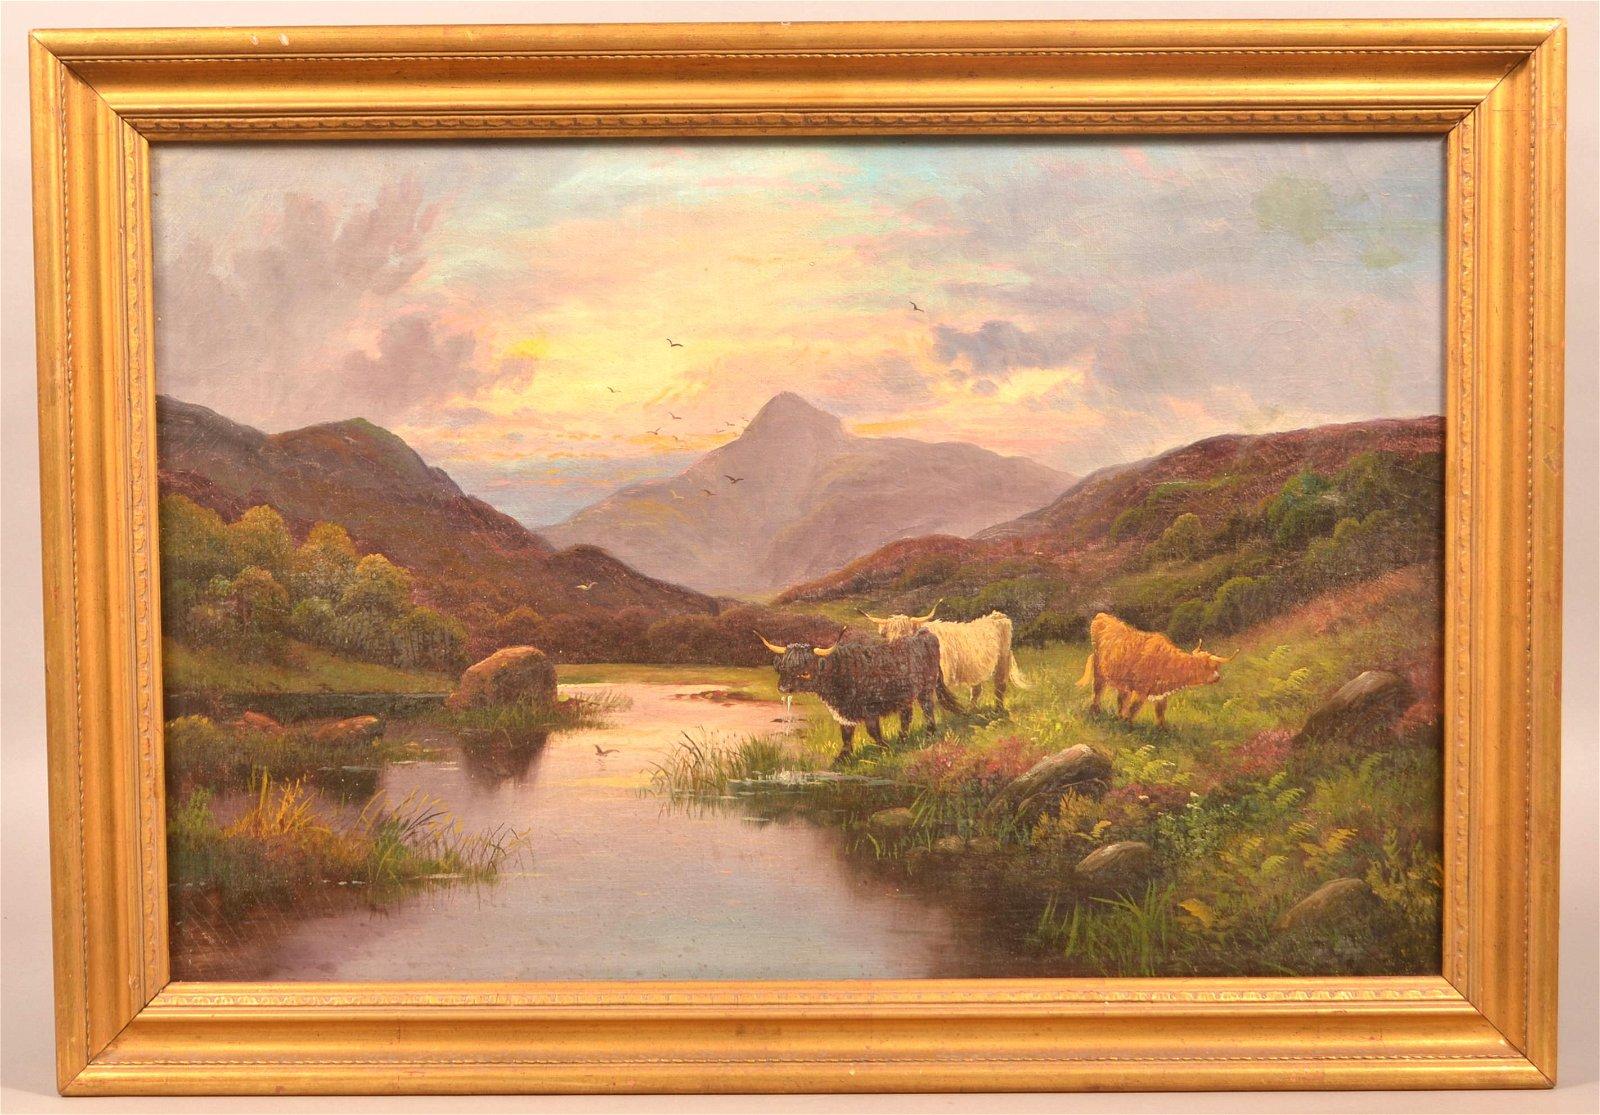 Unsigned Vintage Oil On Canvas Landscape Painting.